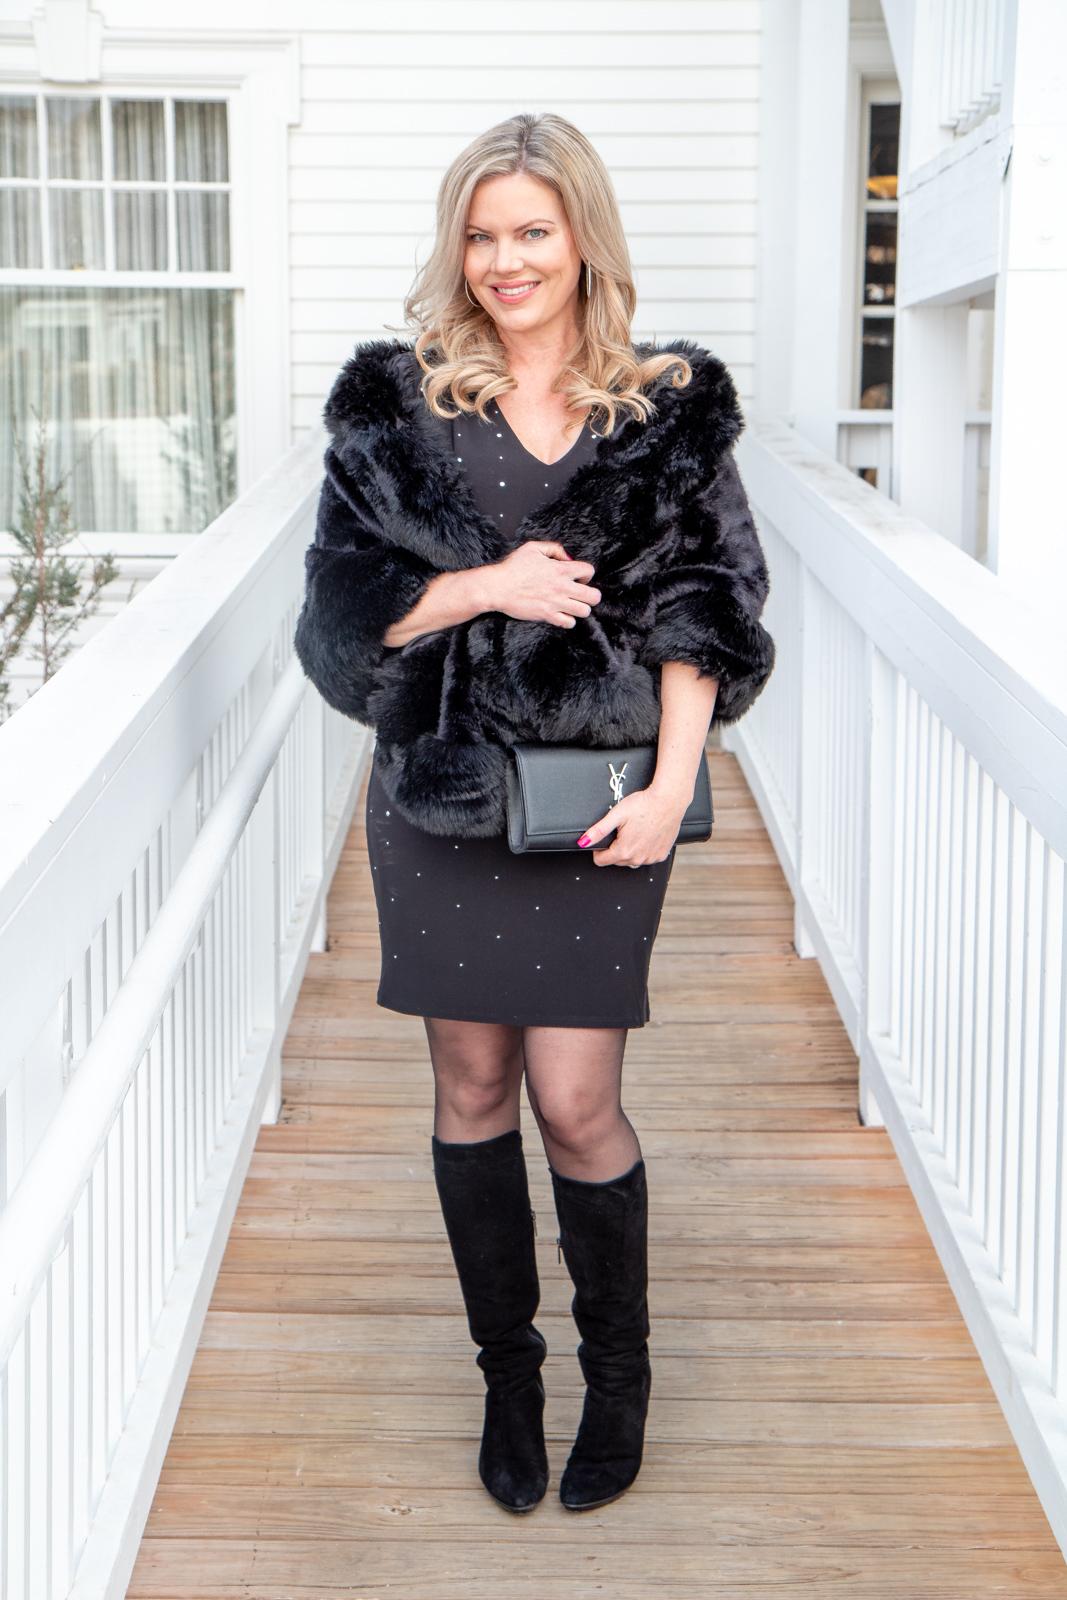 Ways to wear a dress in the winter